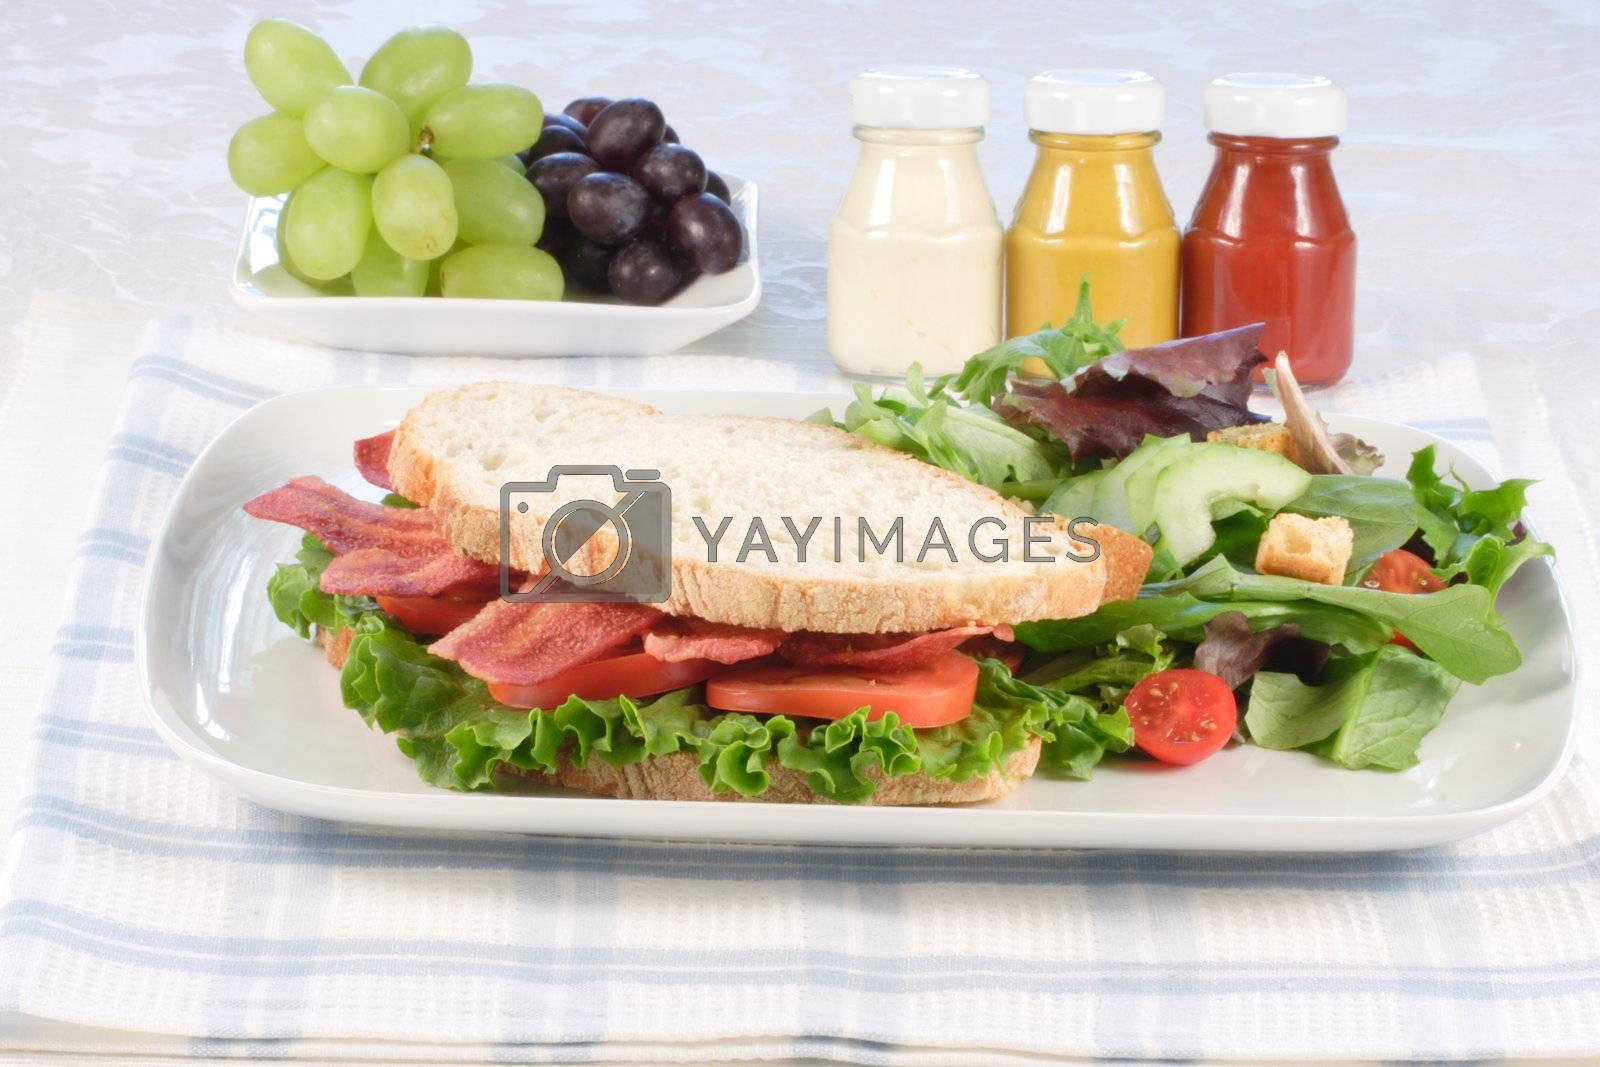 b.l.t organic sandwich by tacar